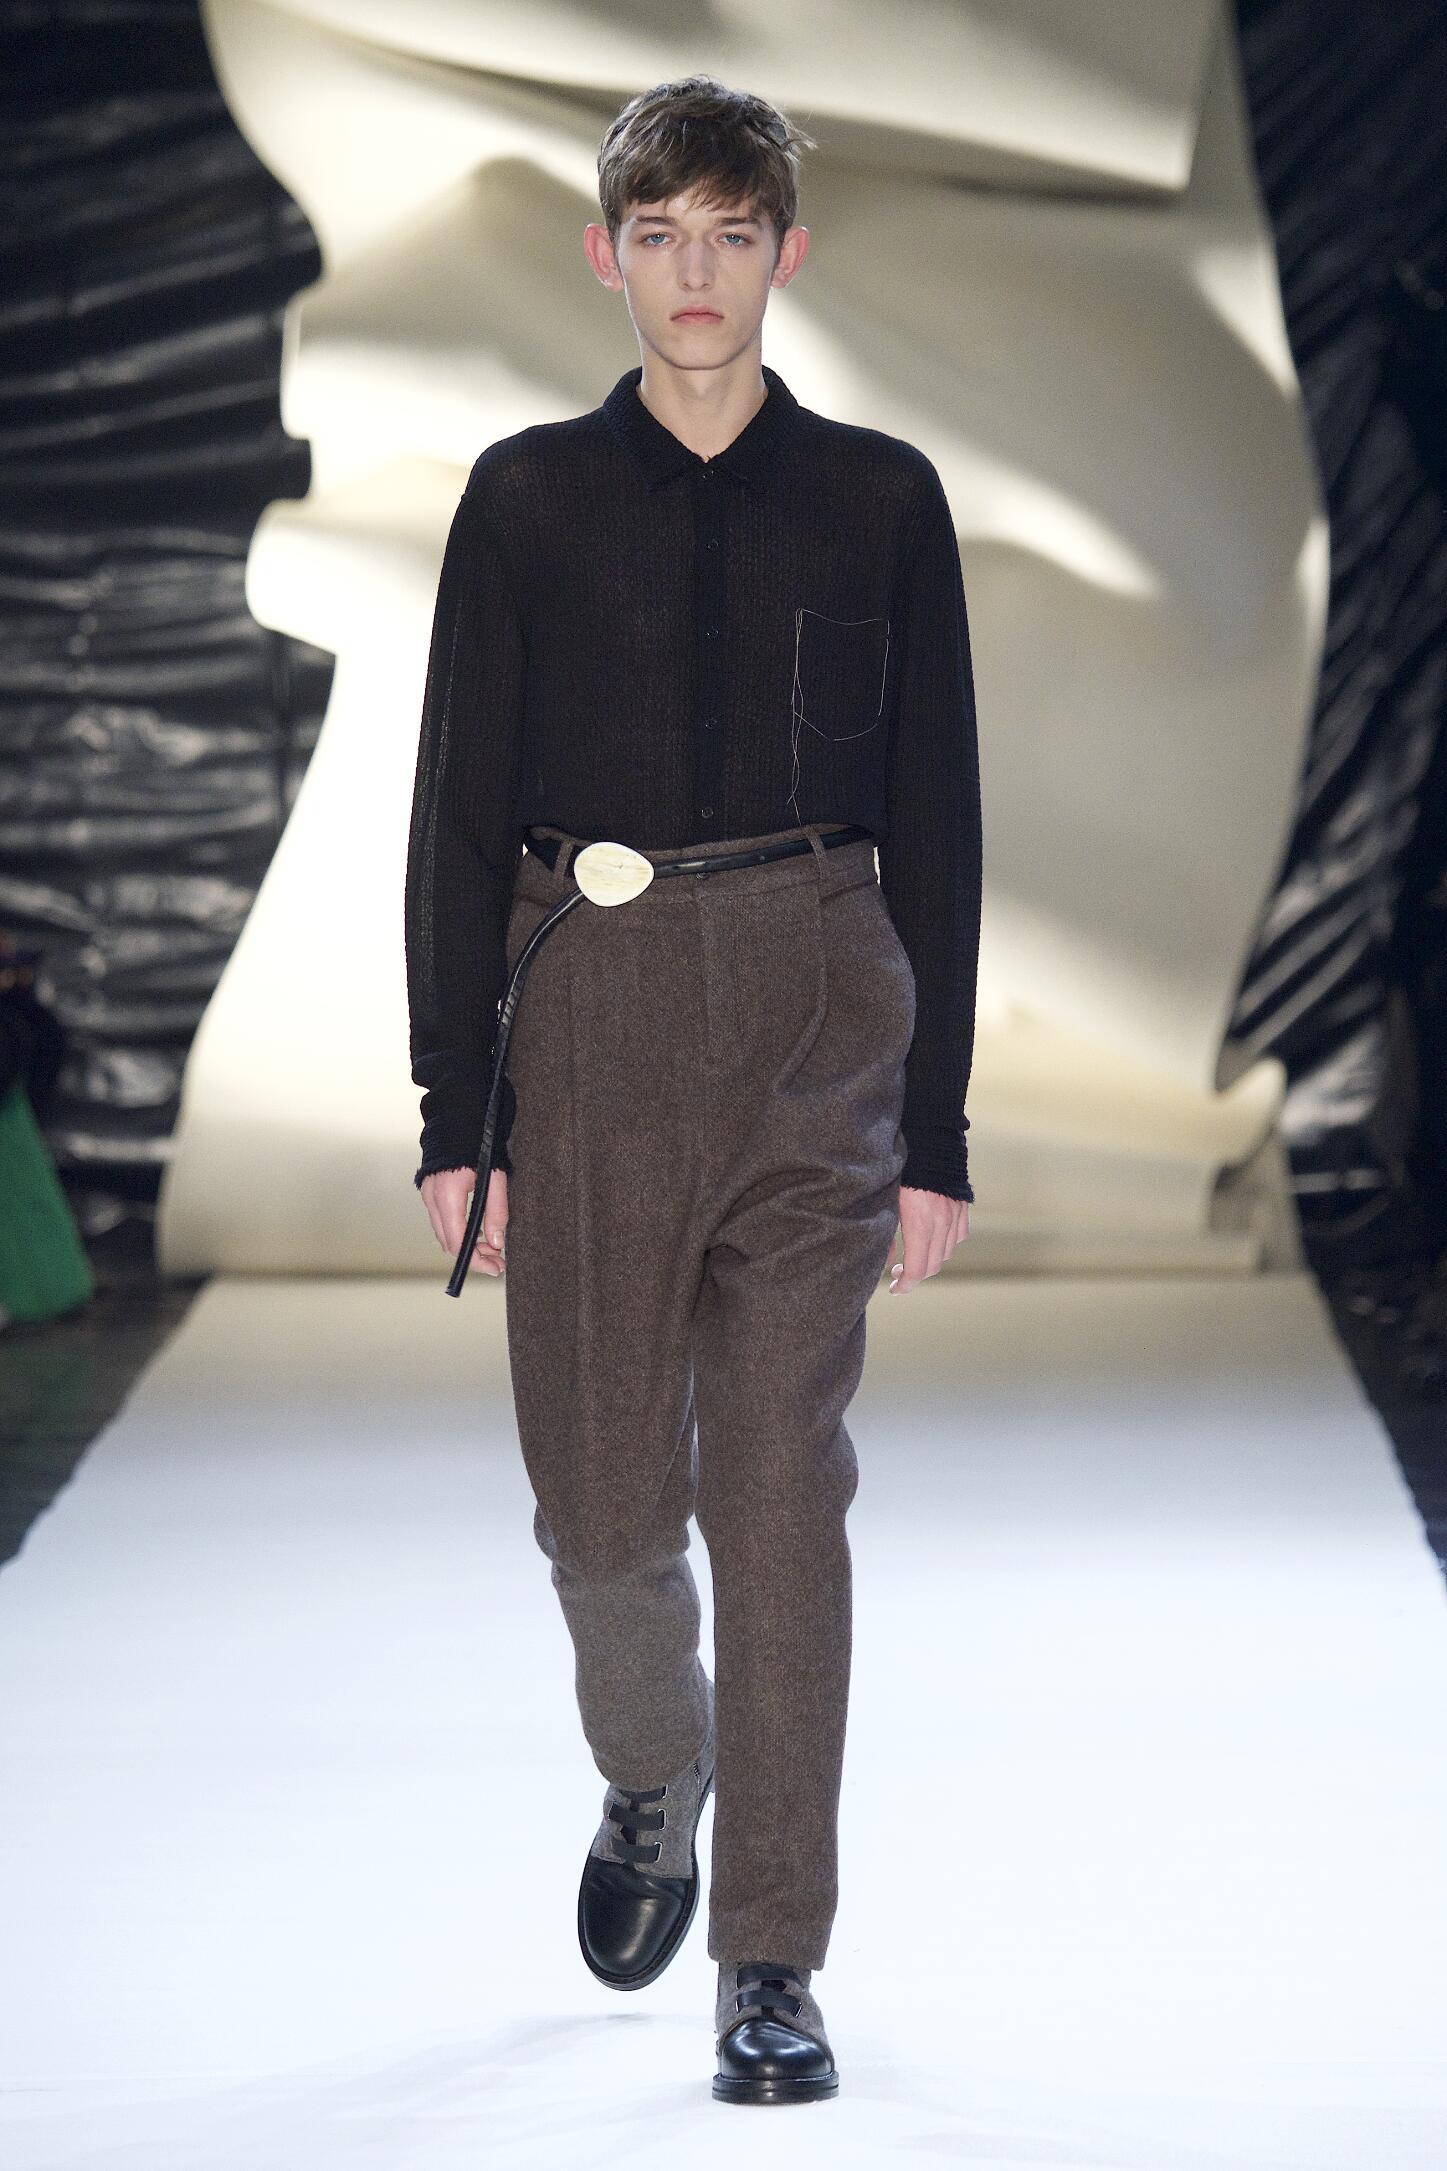 2016 Fall Fashion Man Damir Doma Collection